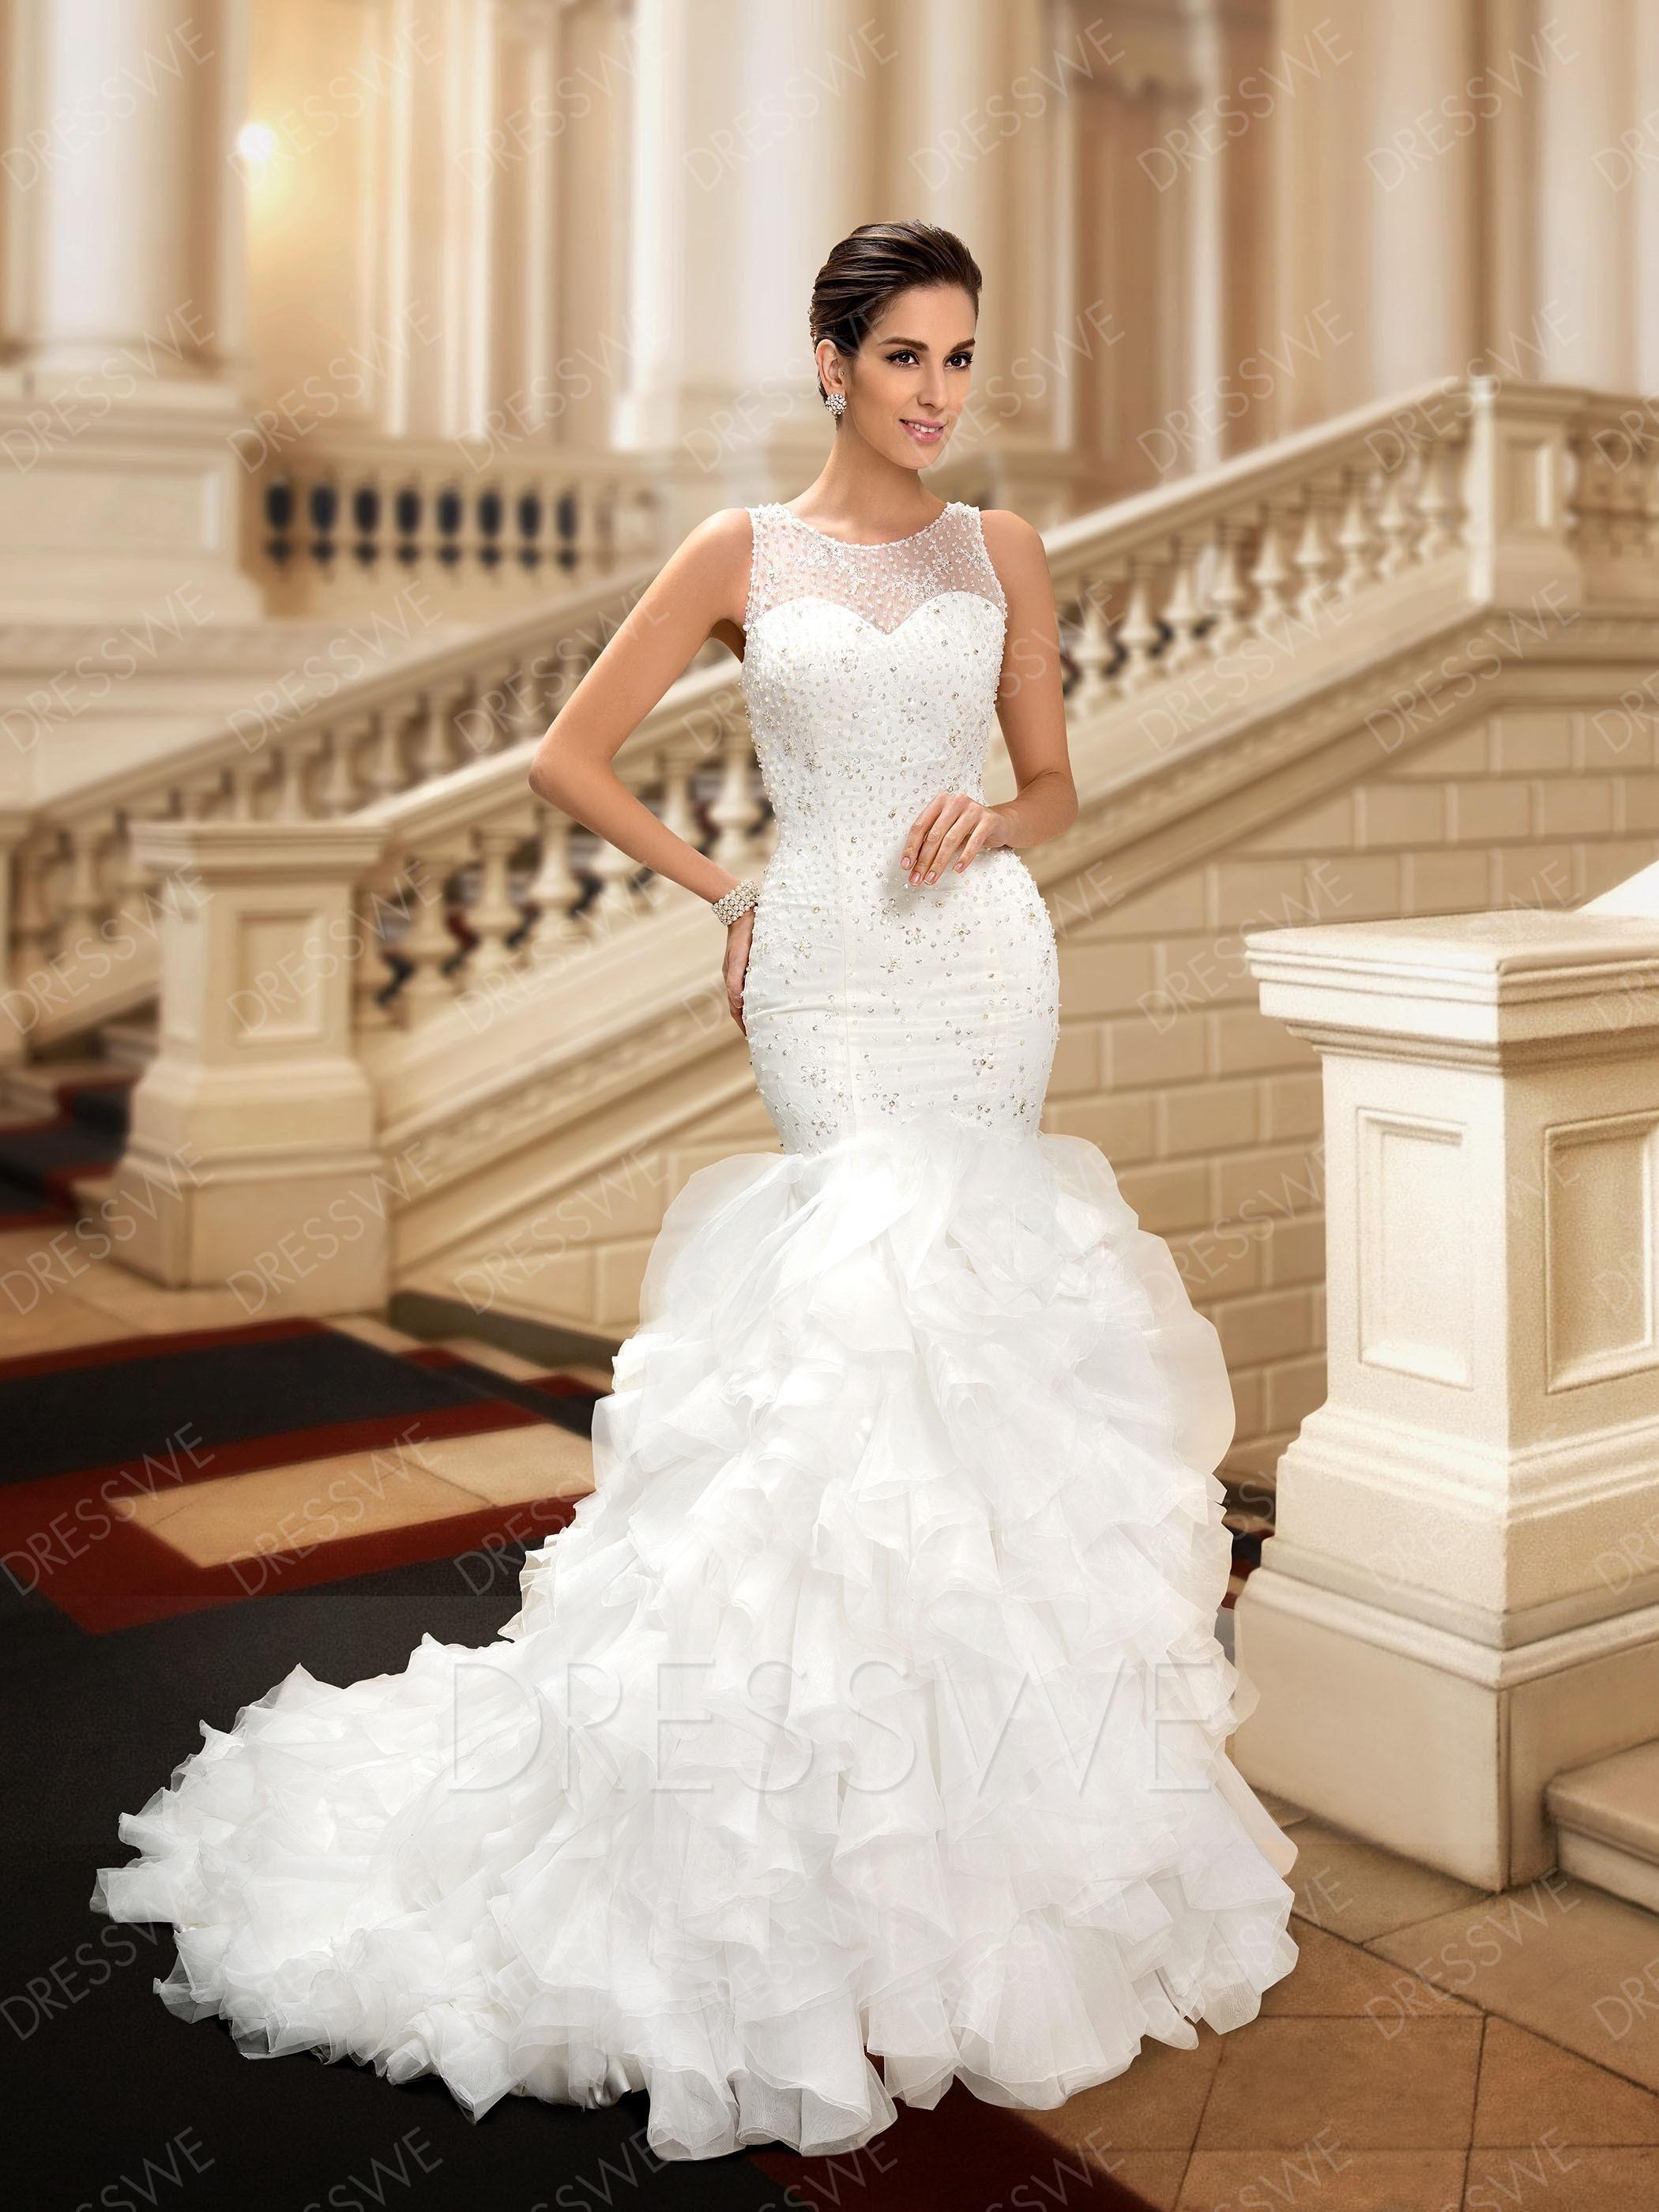 Mermaid ruffle wedding dress  AdoreWe DressWe DressWe FirstClass Scoop Neck Beading Mermaid